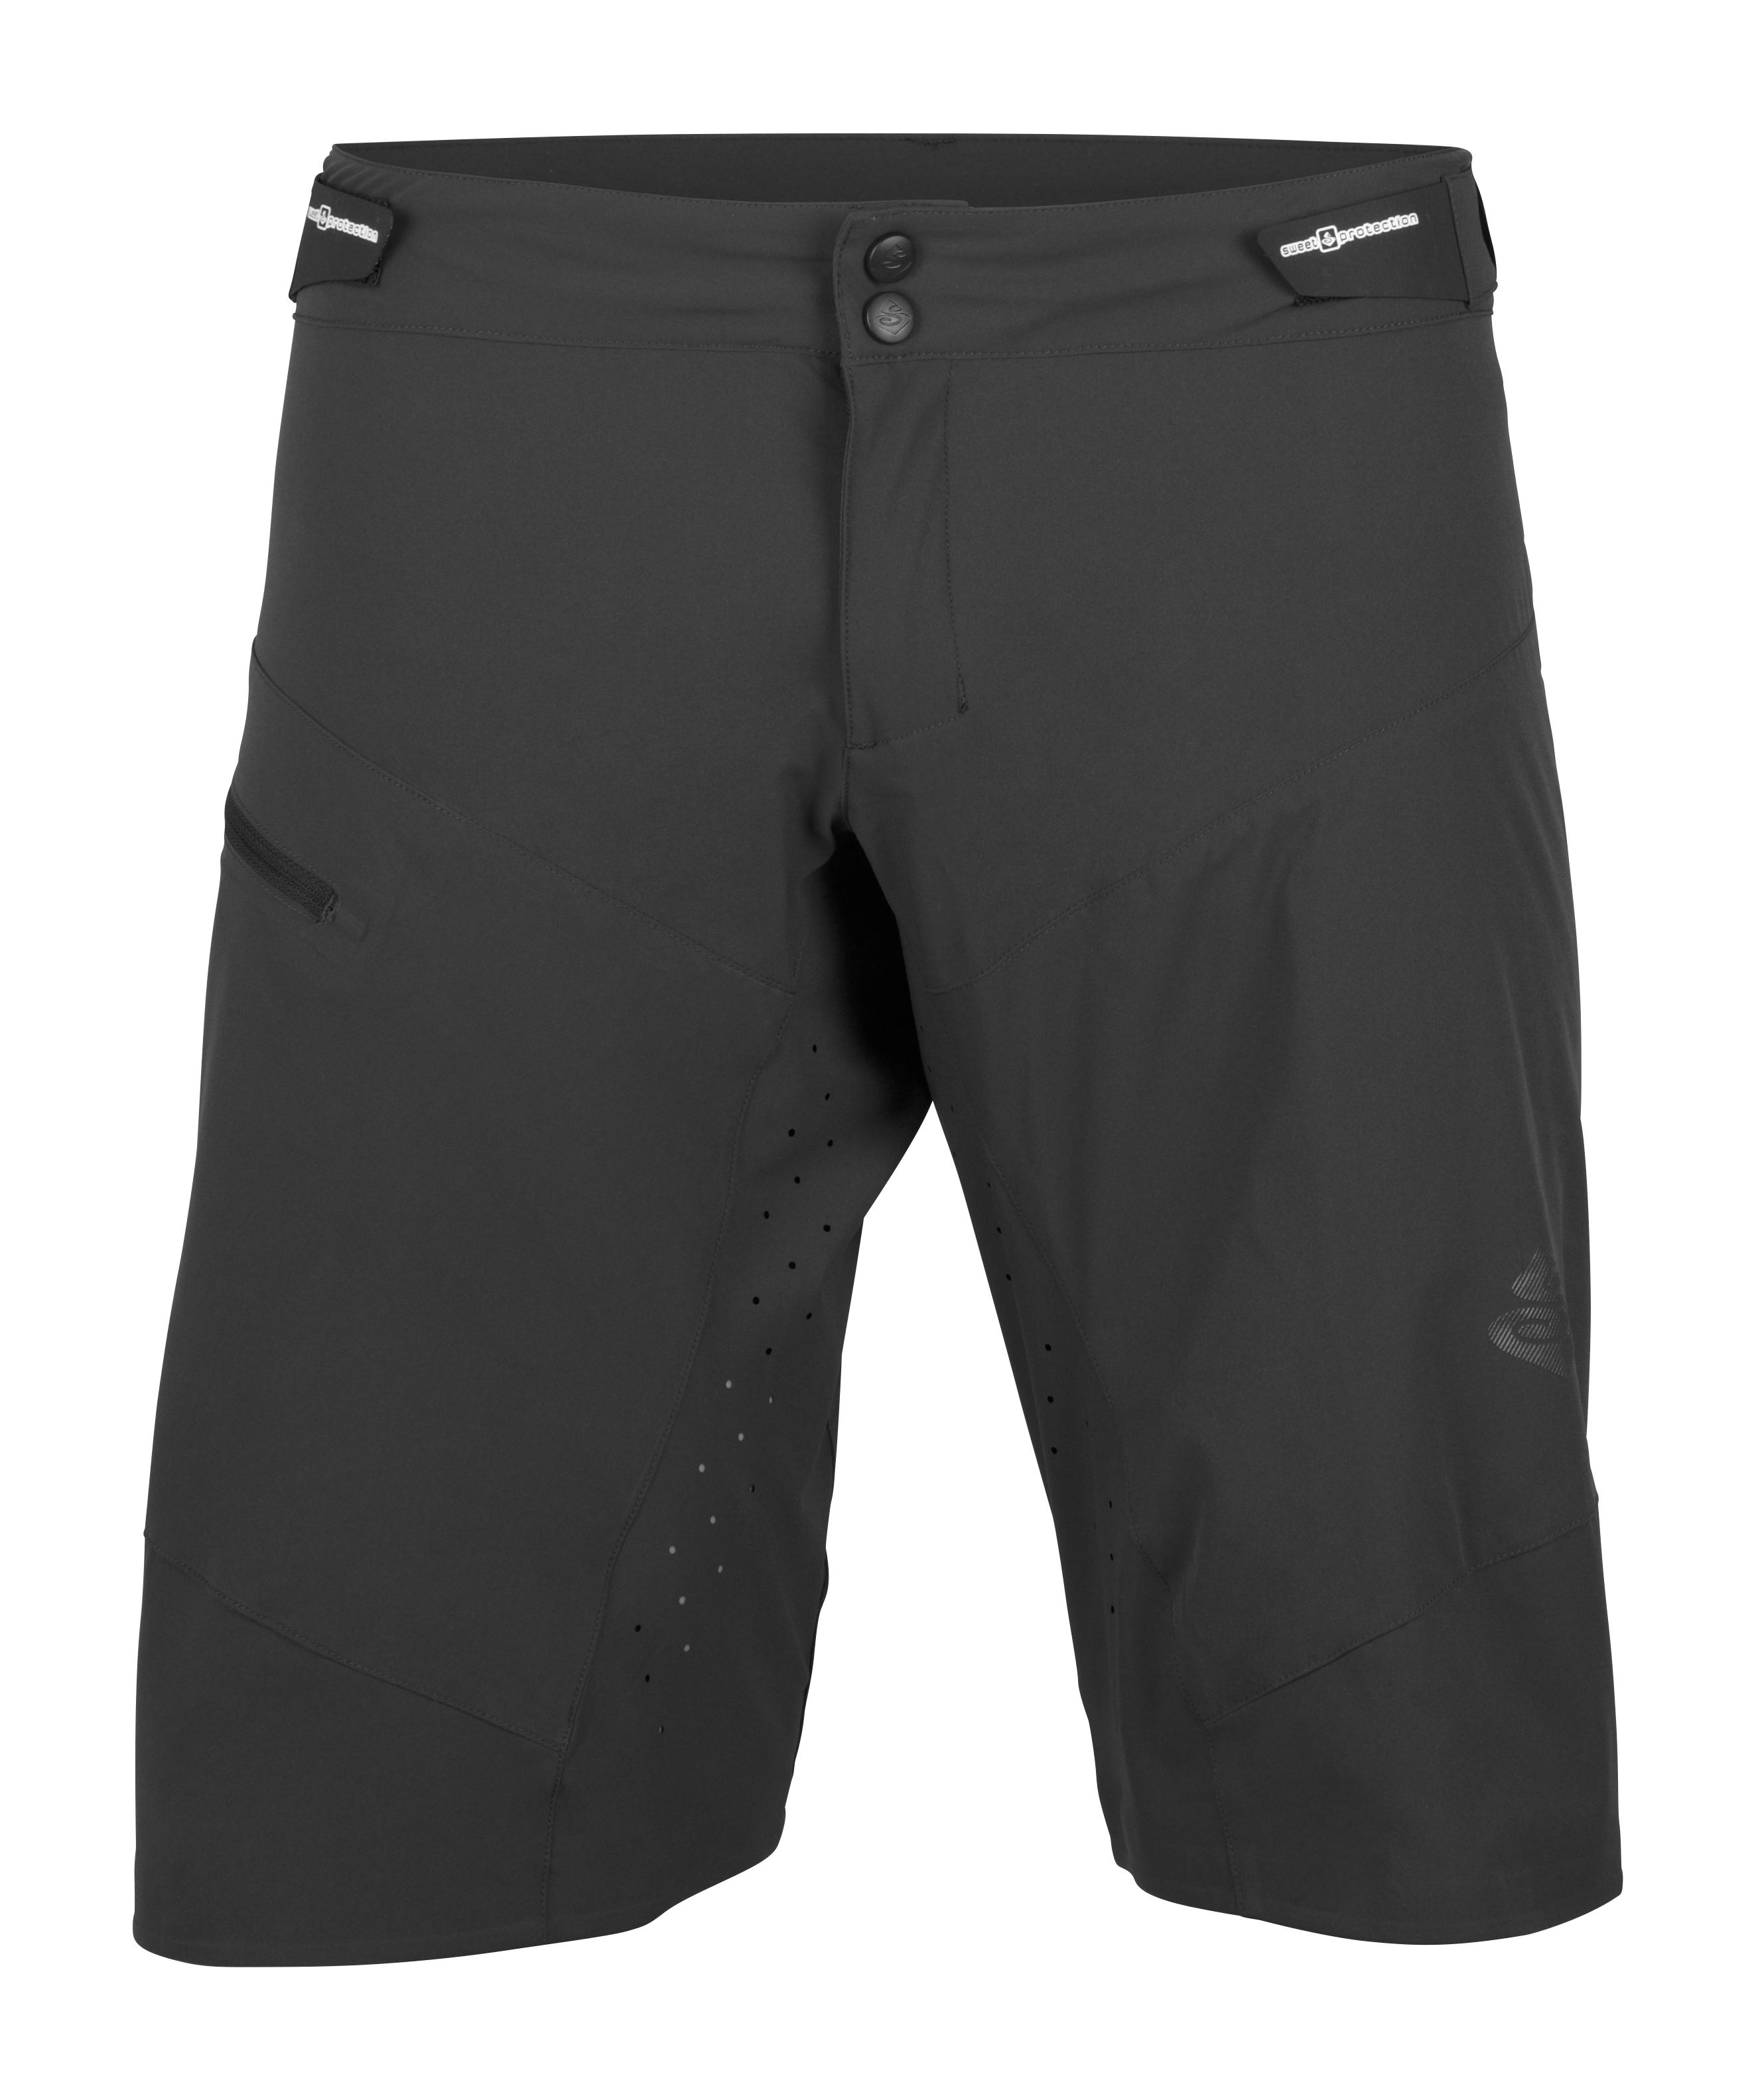 828042-hunter_light_shorts-charcoal_gray-front.jpg